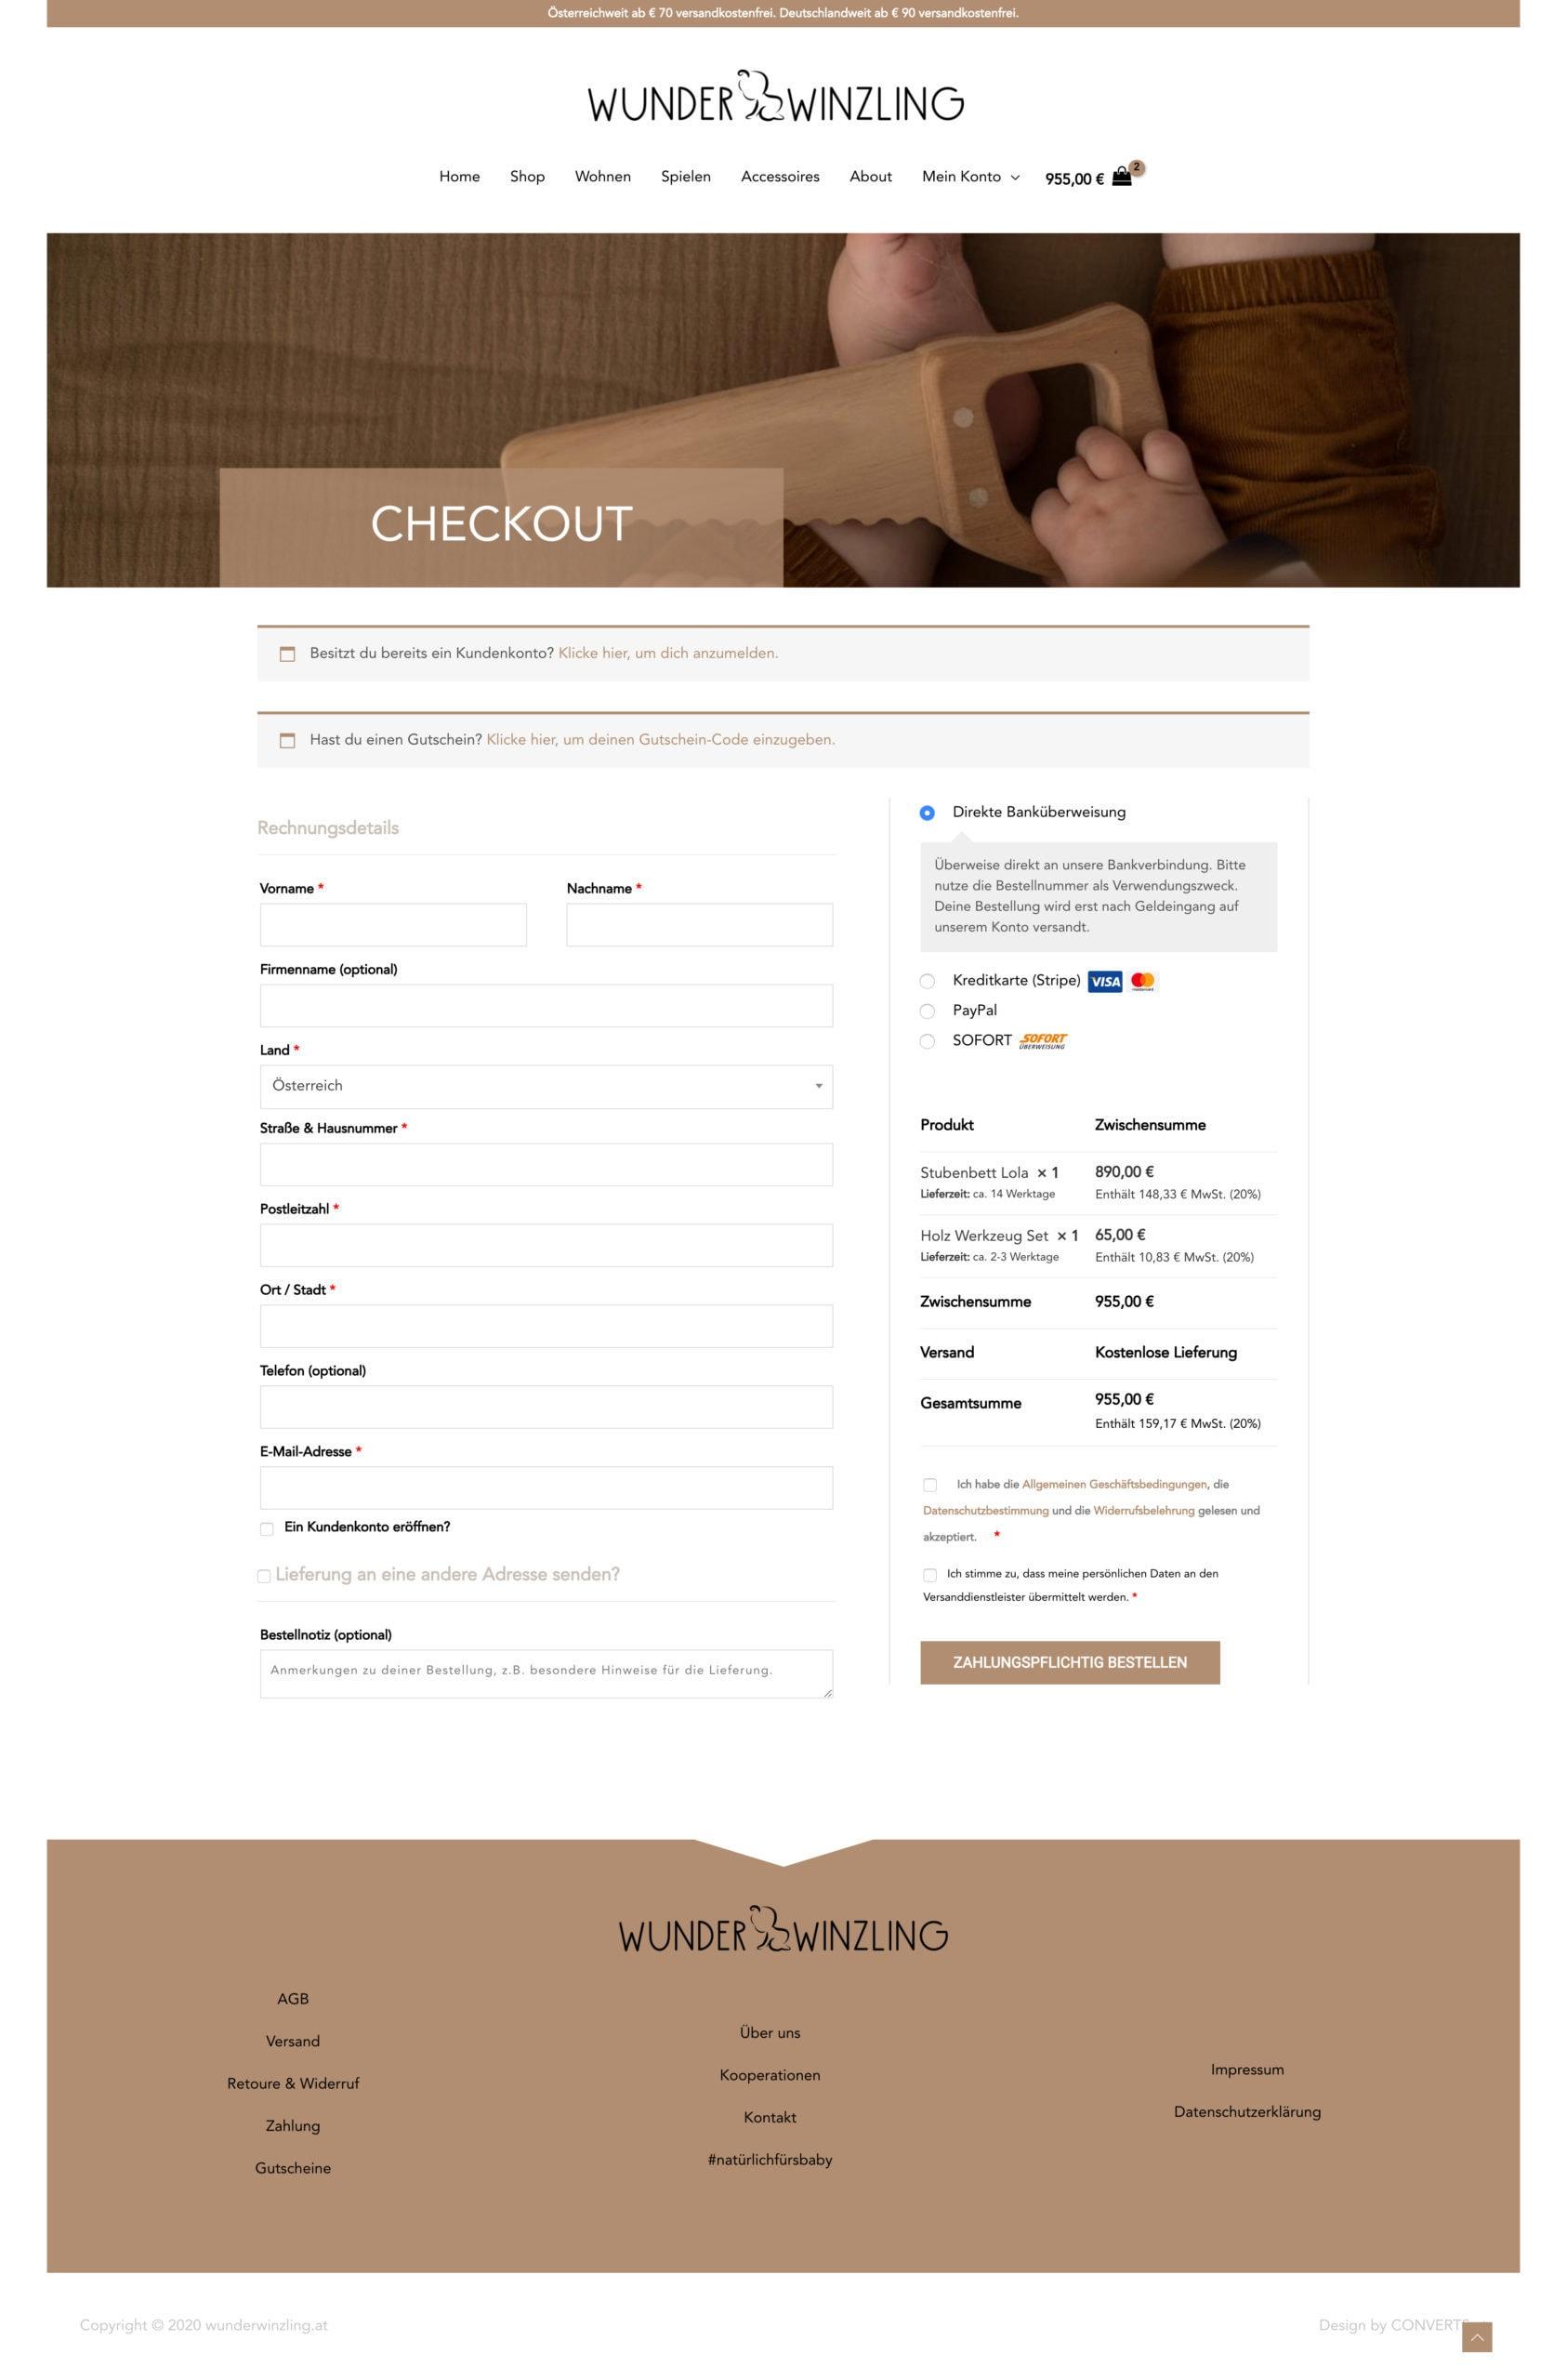 Webdesign Onlineshop Wunderwinzling Checkout